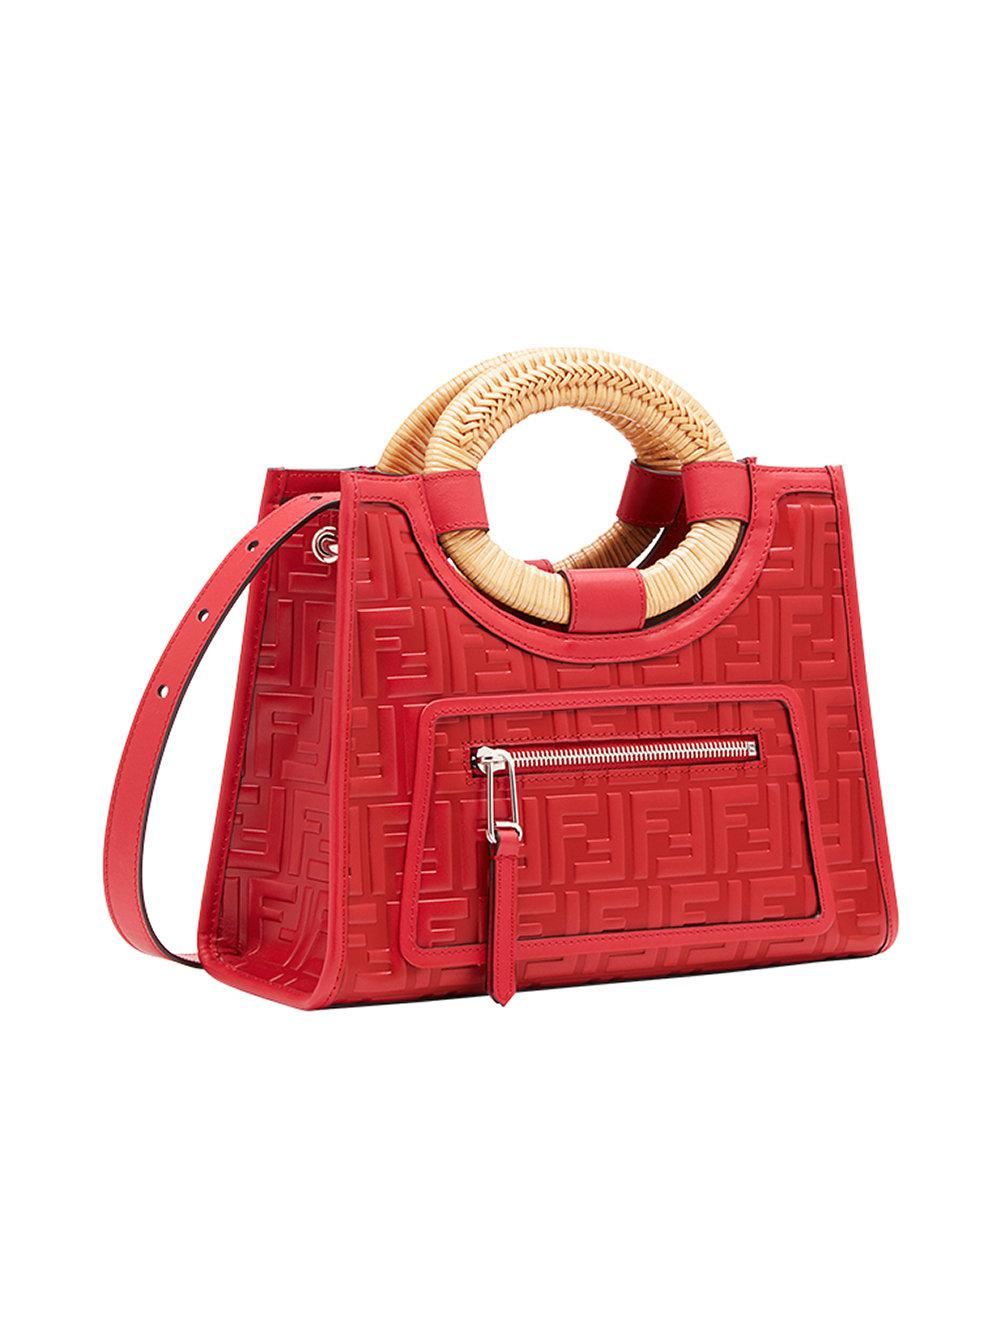 2f51b2eca2c2 Fendi - Red Runaway Shopper Bag - Lyst. View fullscreen